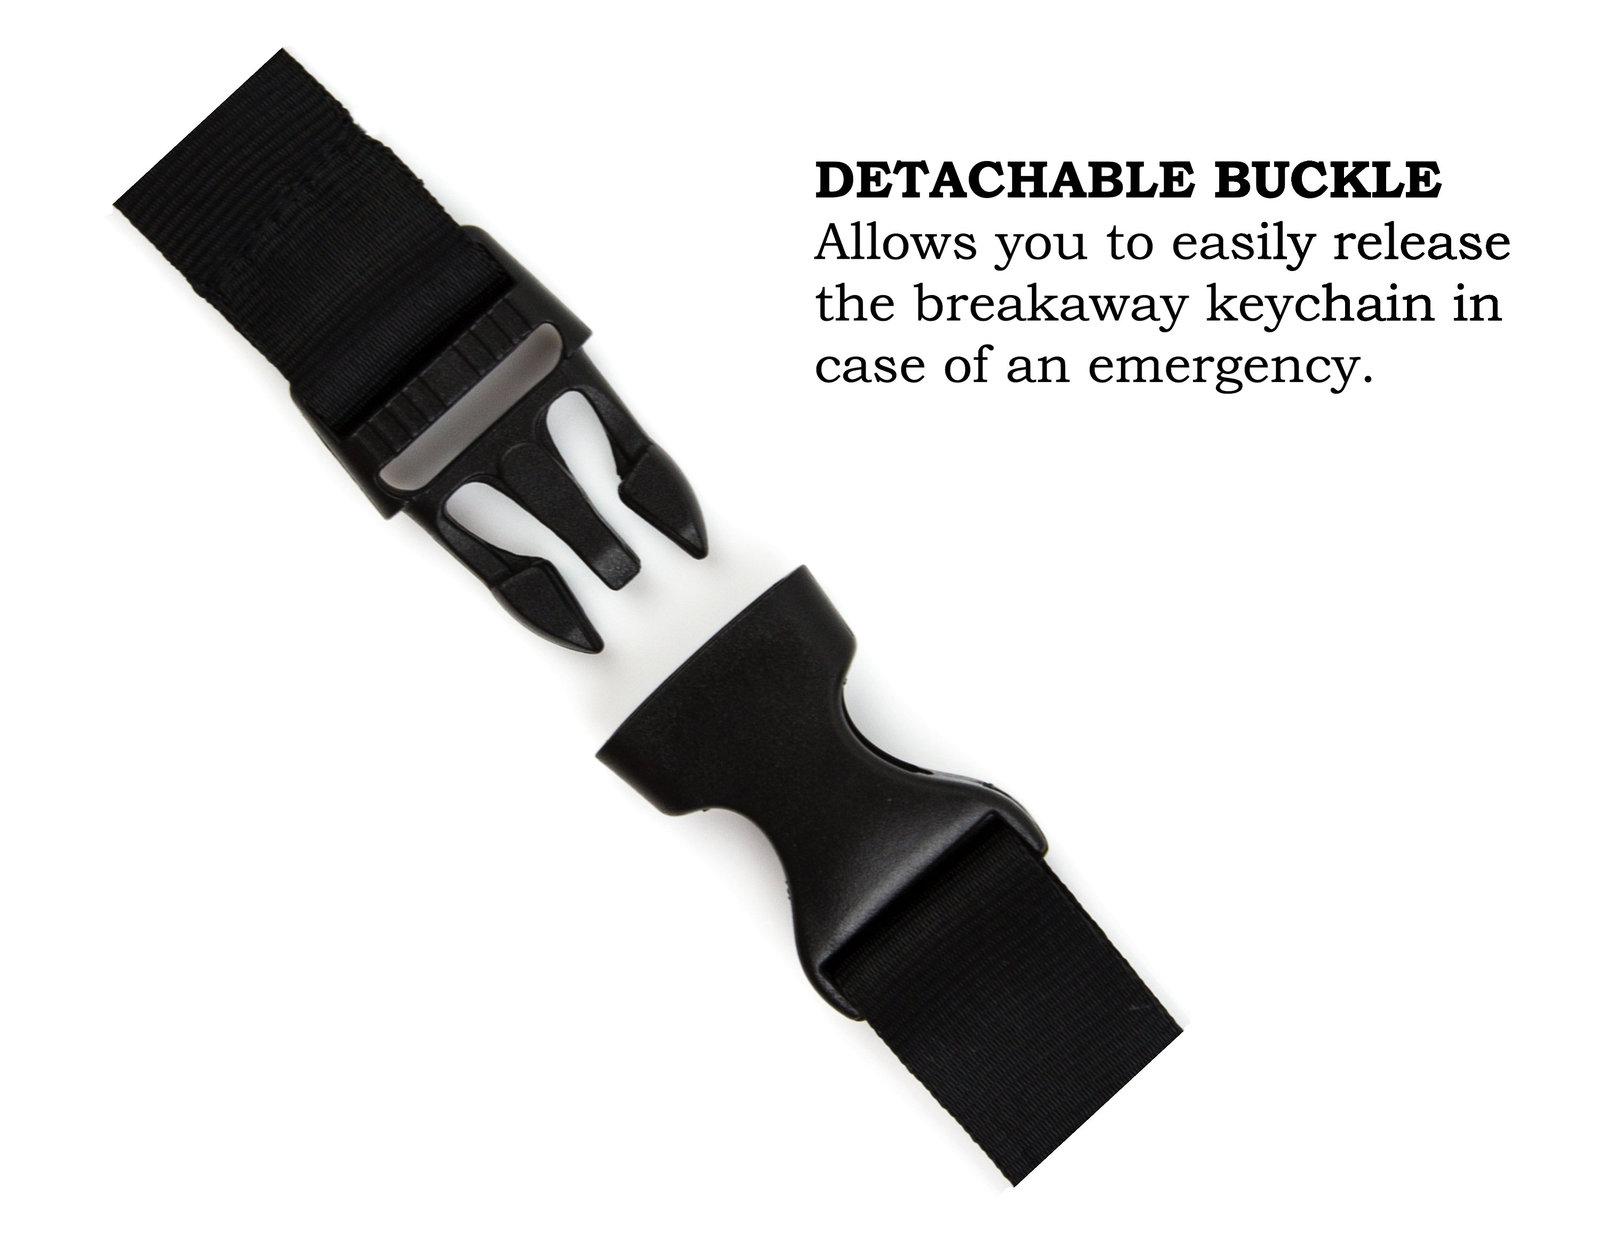 Hufflepuff Badger Lanyard Keychain and ID Holder with Detachable, Breakaway Buck